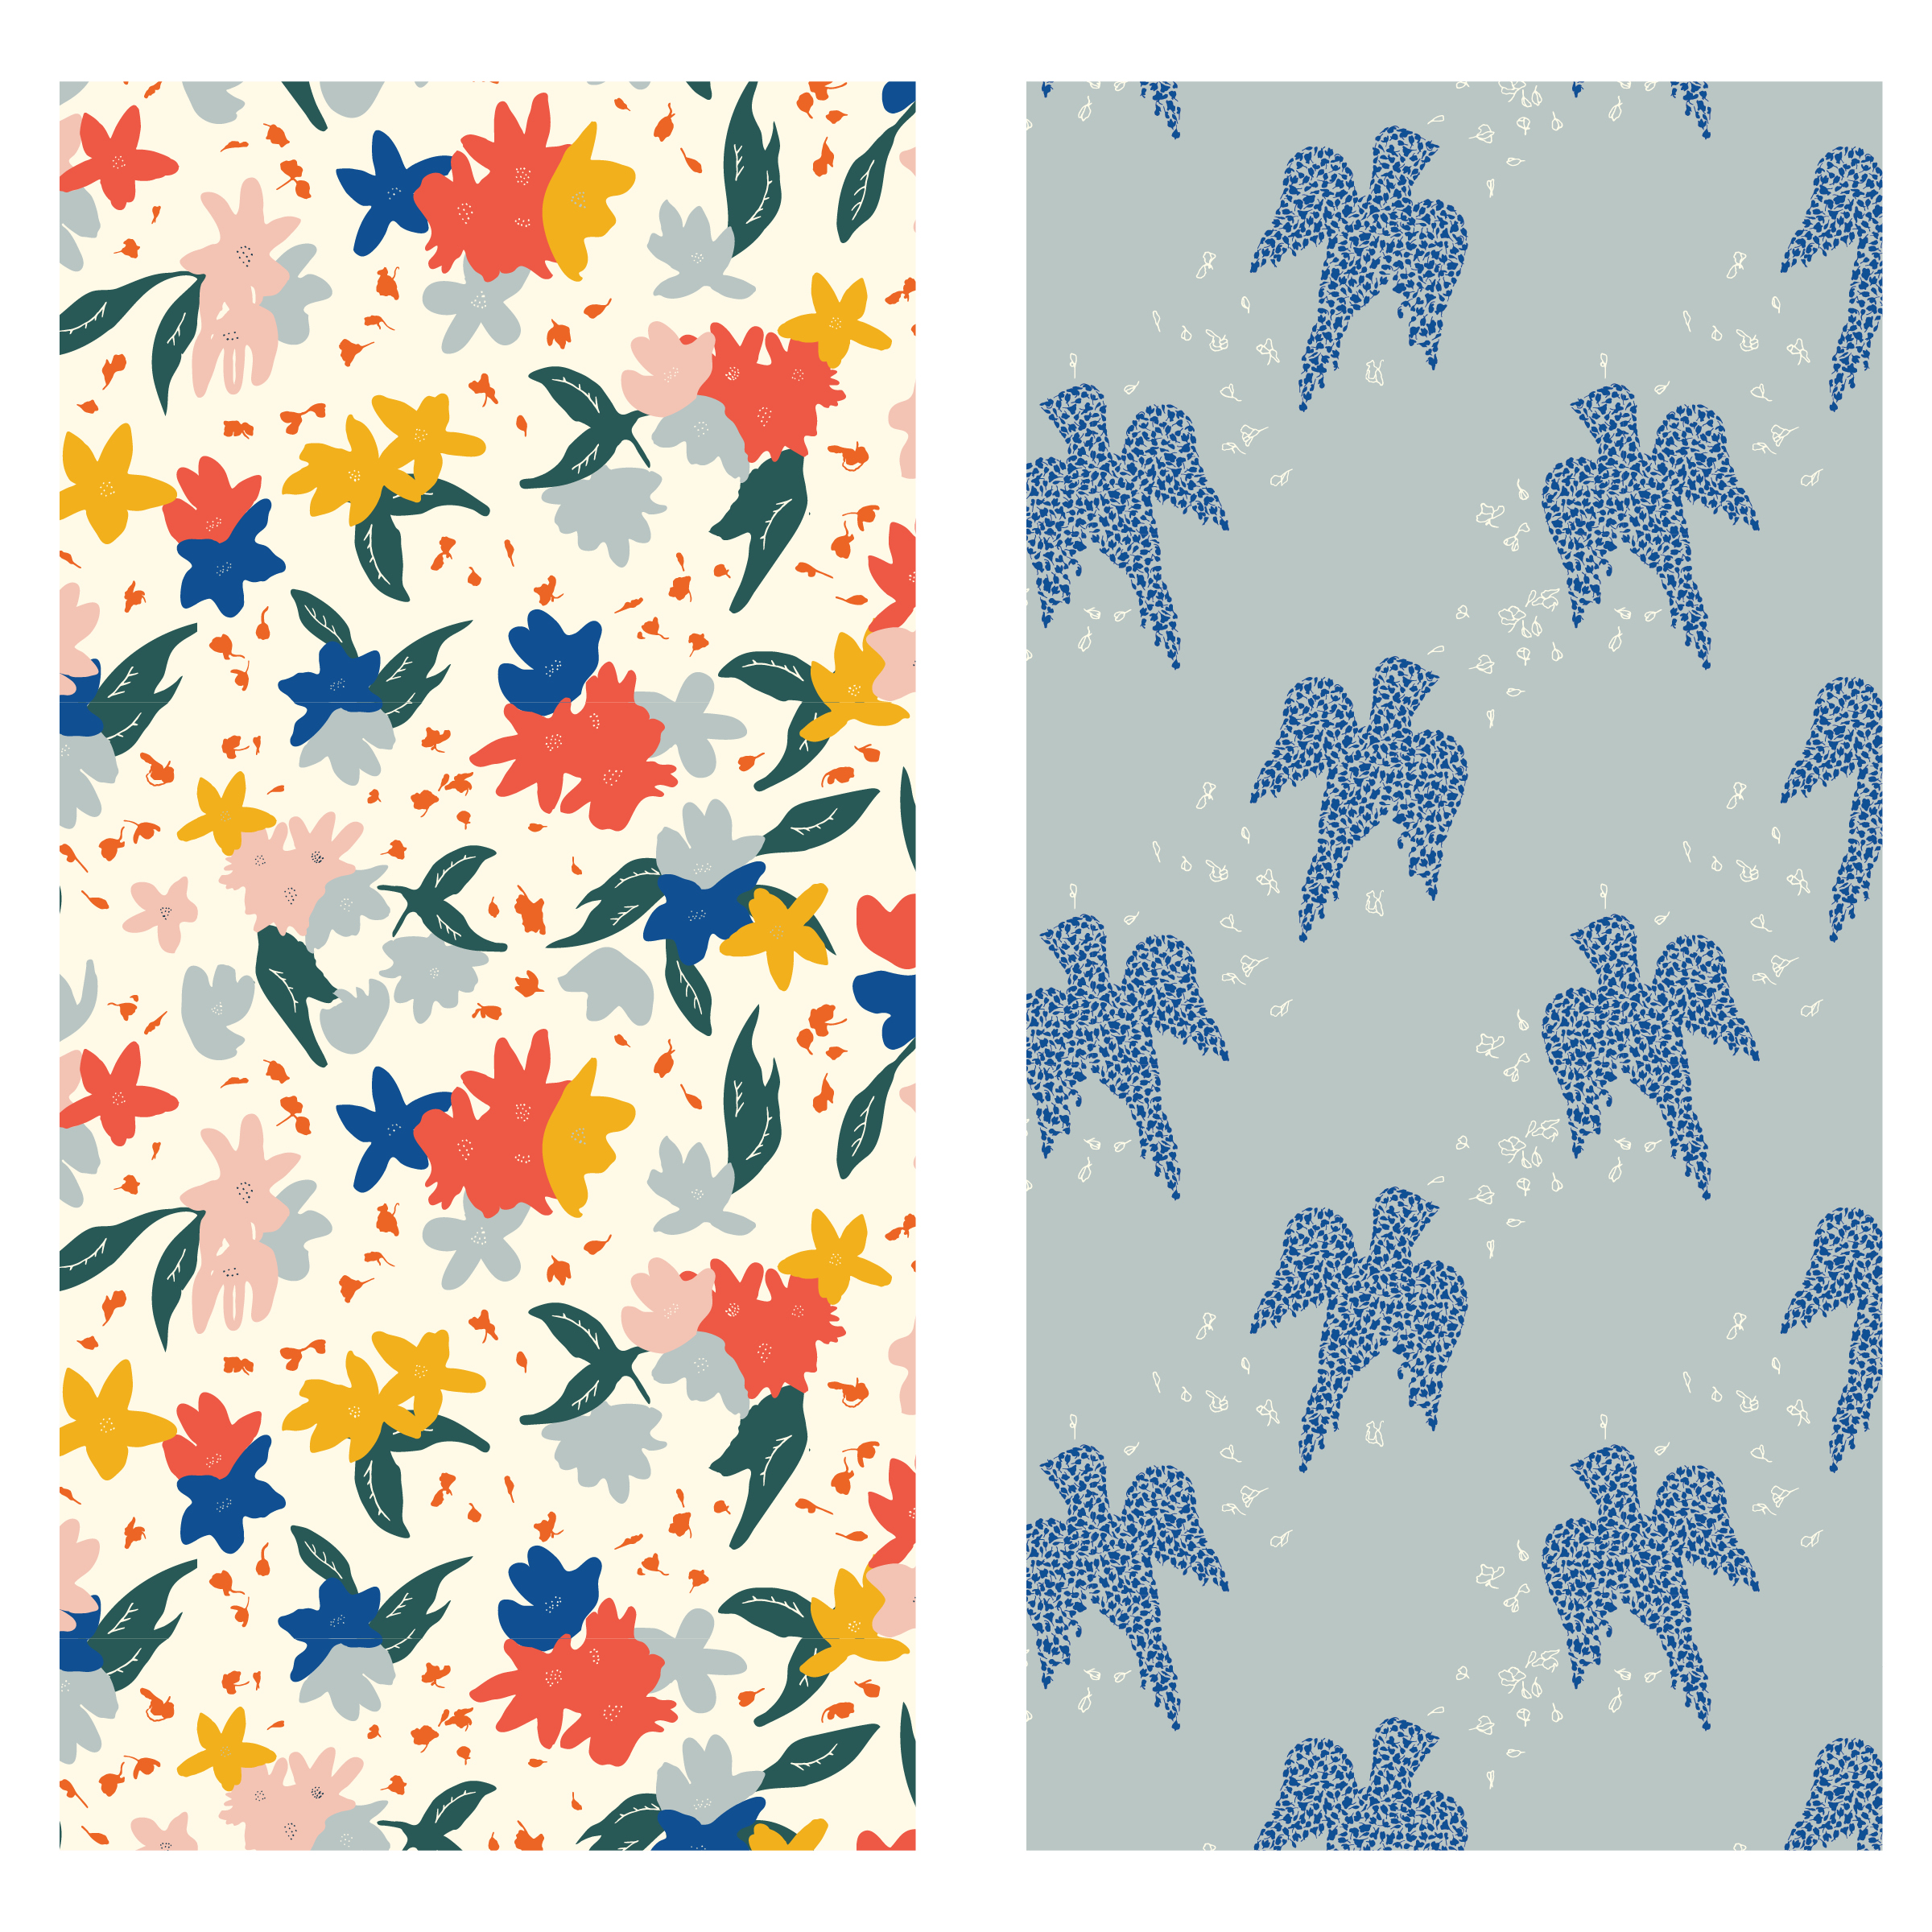 by HOPE johnson surface pattern design_pattern pair164.jpg